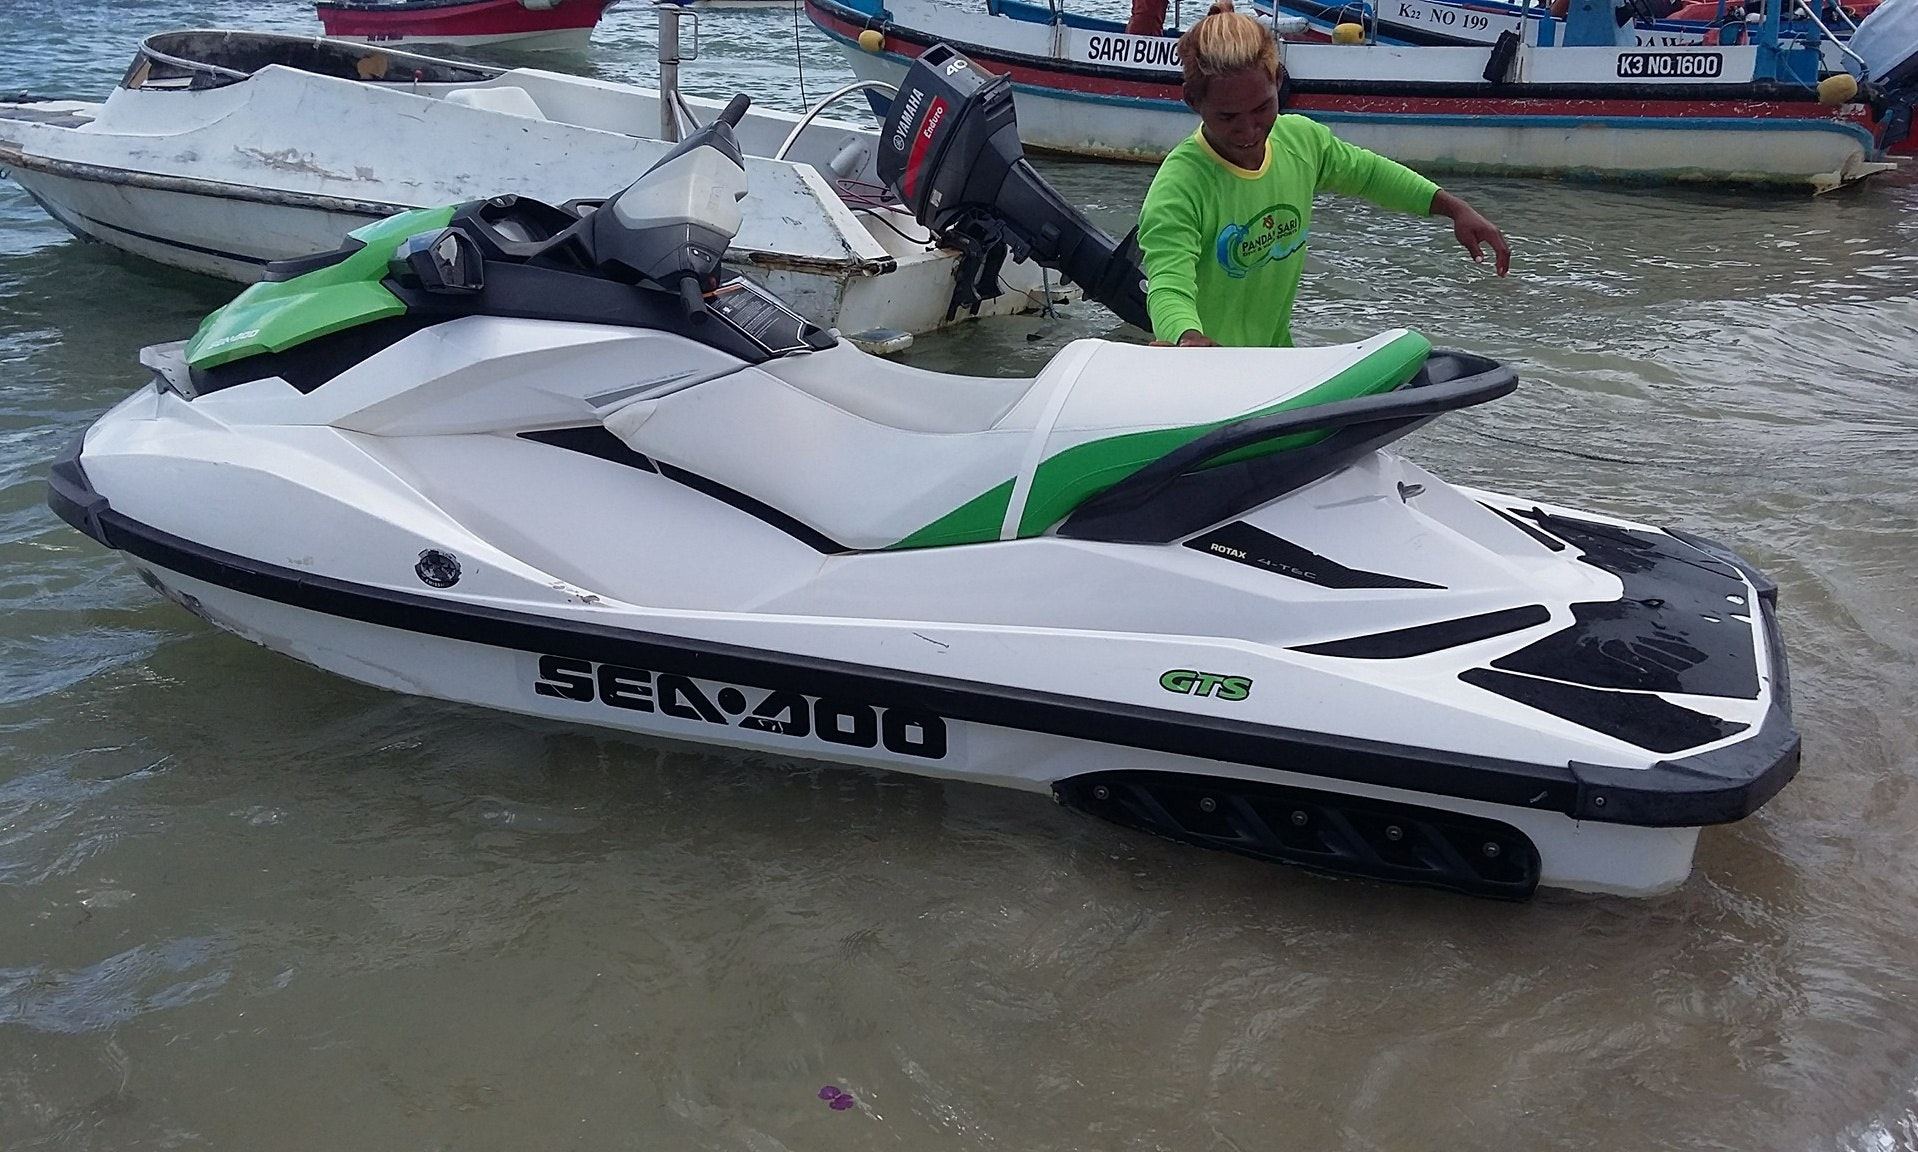 Rent Seadoo Jet Ski In Kuta Selatan Bali Getmyboat